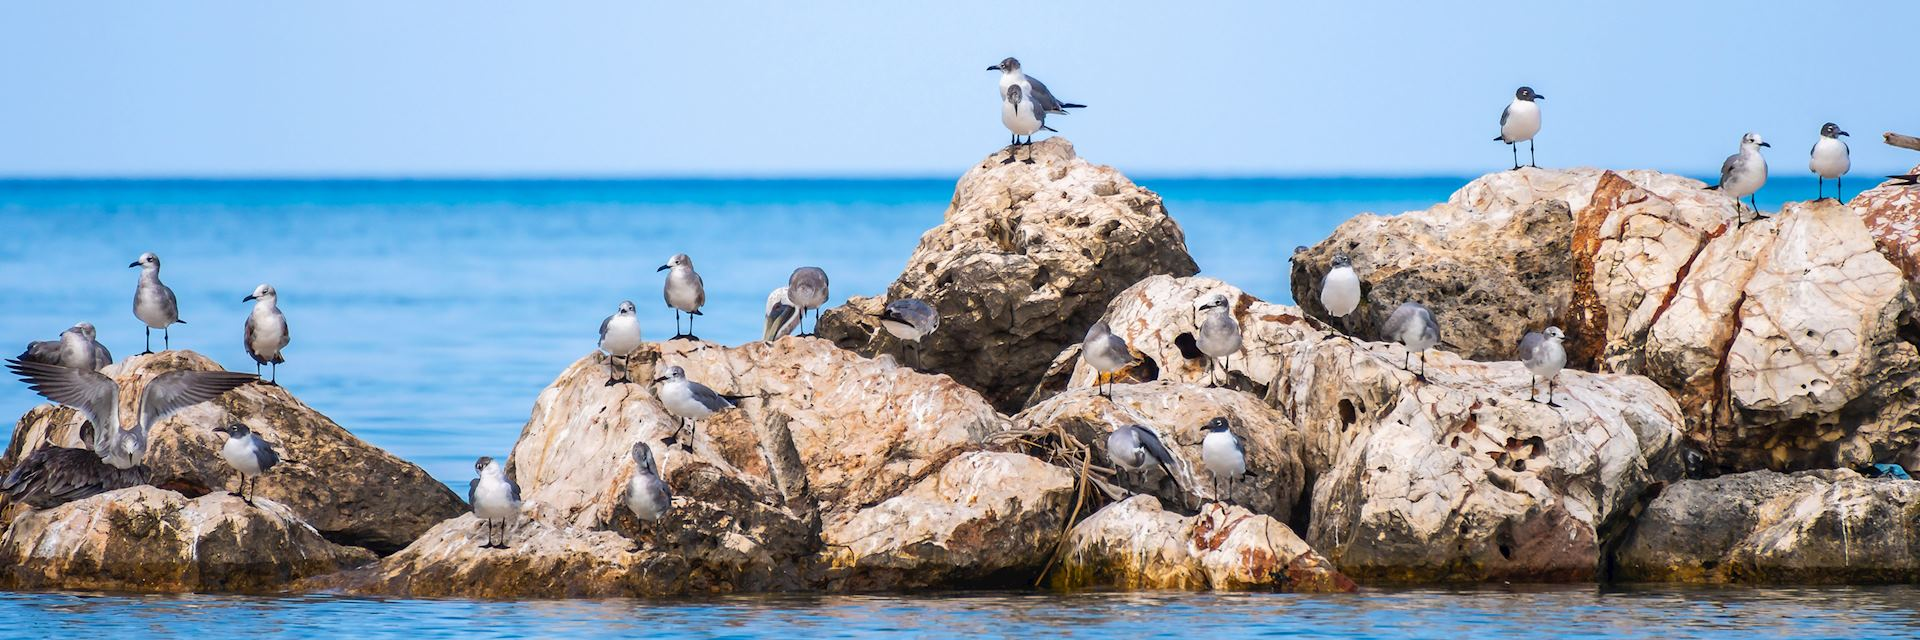 Birds on the rocks in Montego Bay, Jamaica